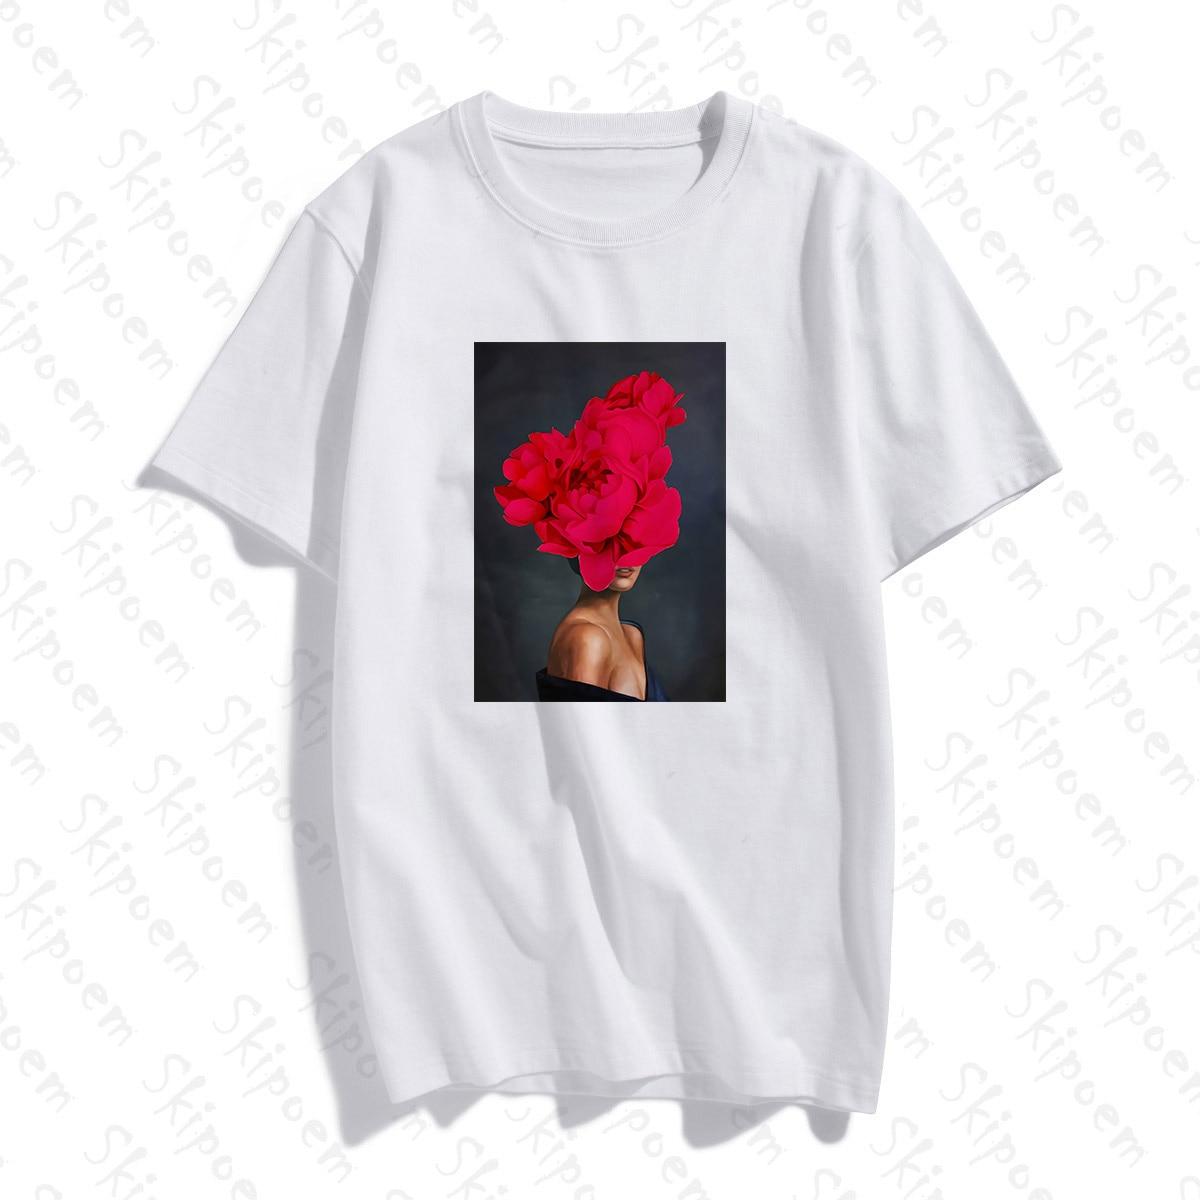 Photography Art Fashion Sexy Woman With Flower T-shirt Women Aesthetic Kawaii Cotton Short Sleeve Plus Size Top Tees Streetwear